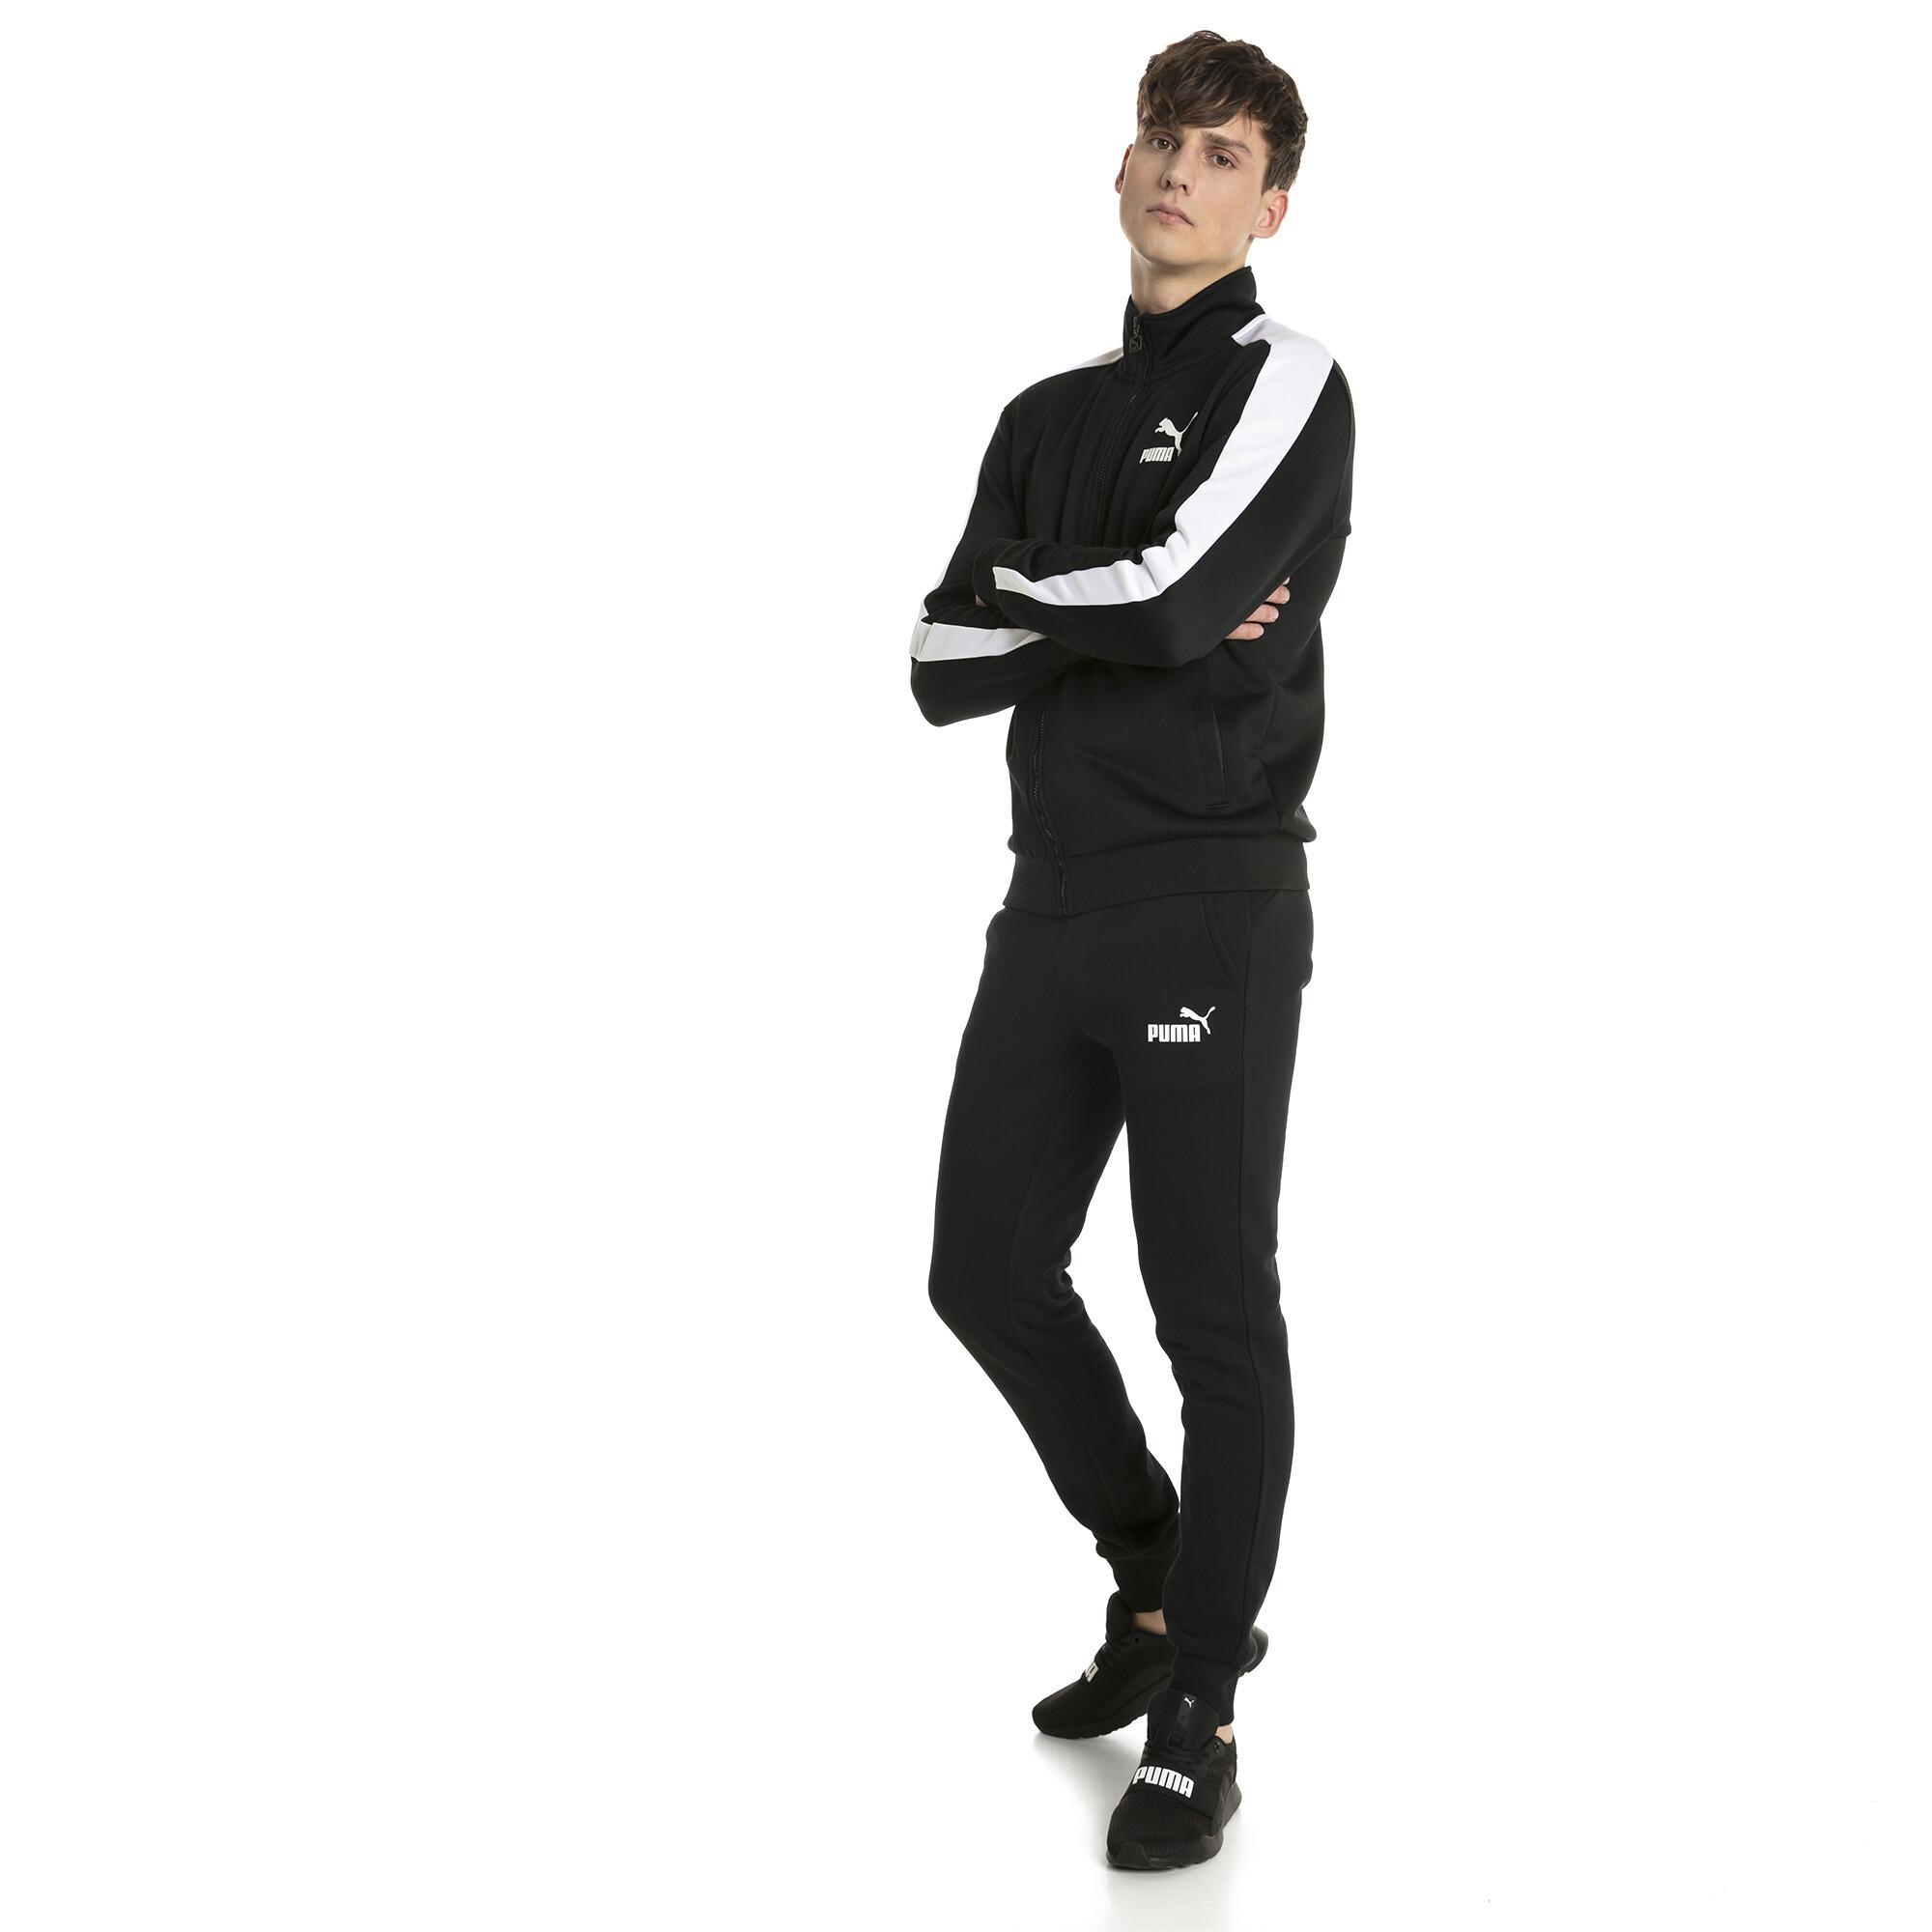 Puma-Para-hombres-Pantalones-de-Punto-Polar-Essentials-Hombre-De-punto-Pantalones-Basics miniatura 15